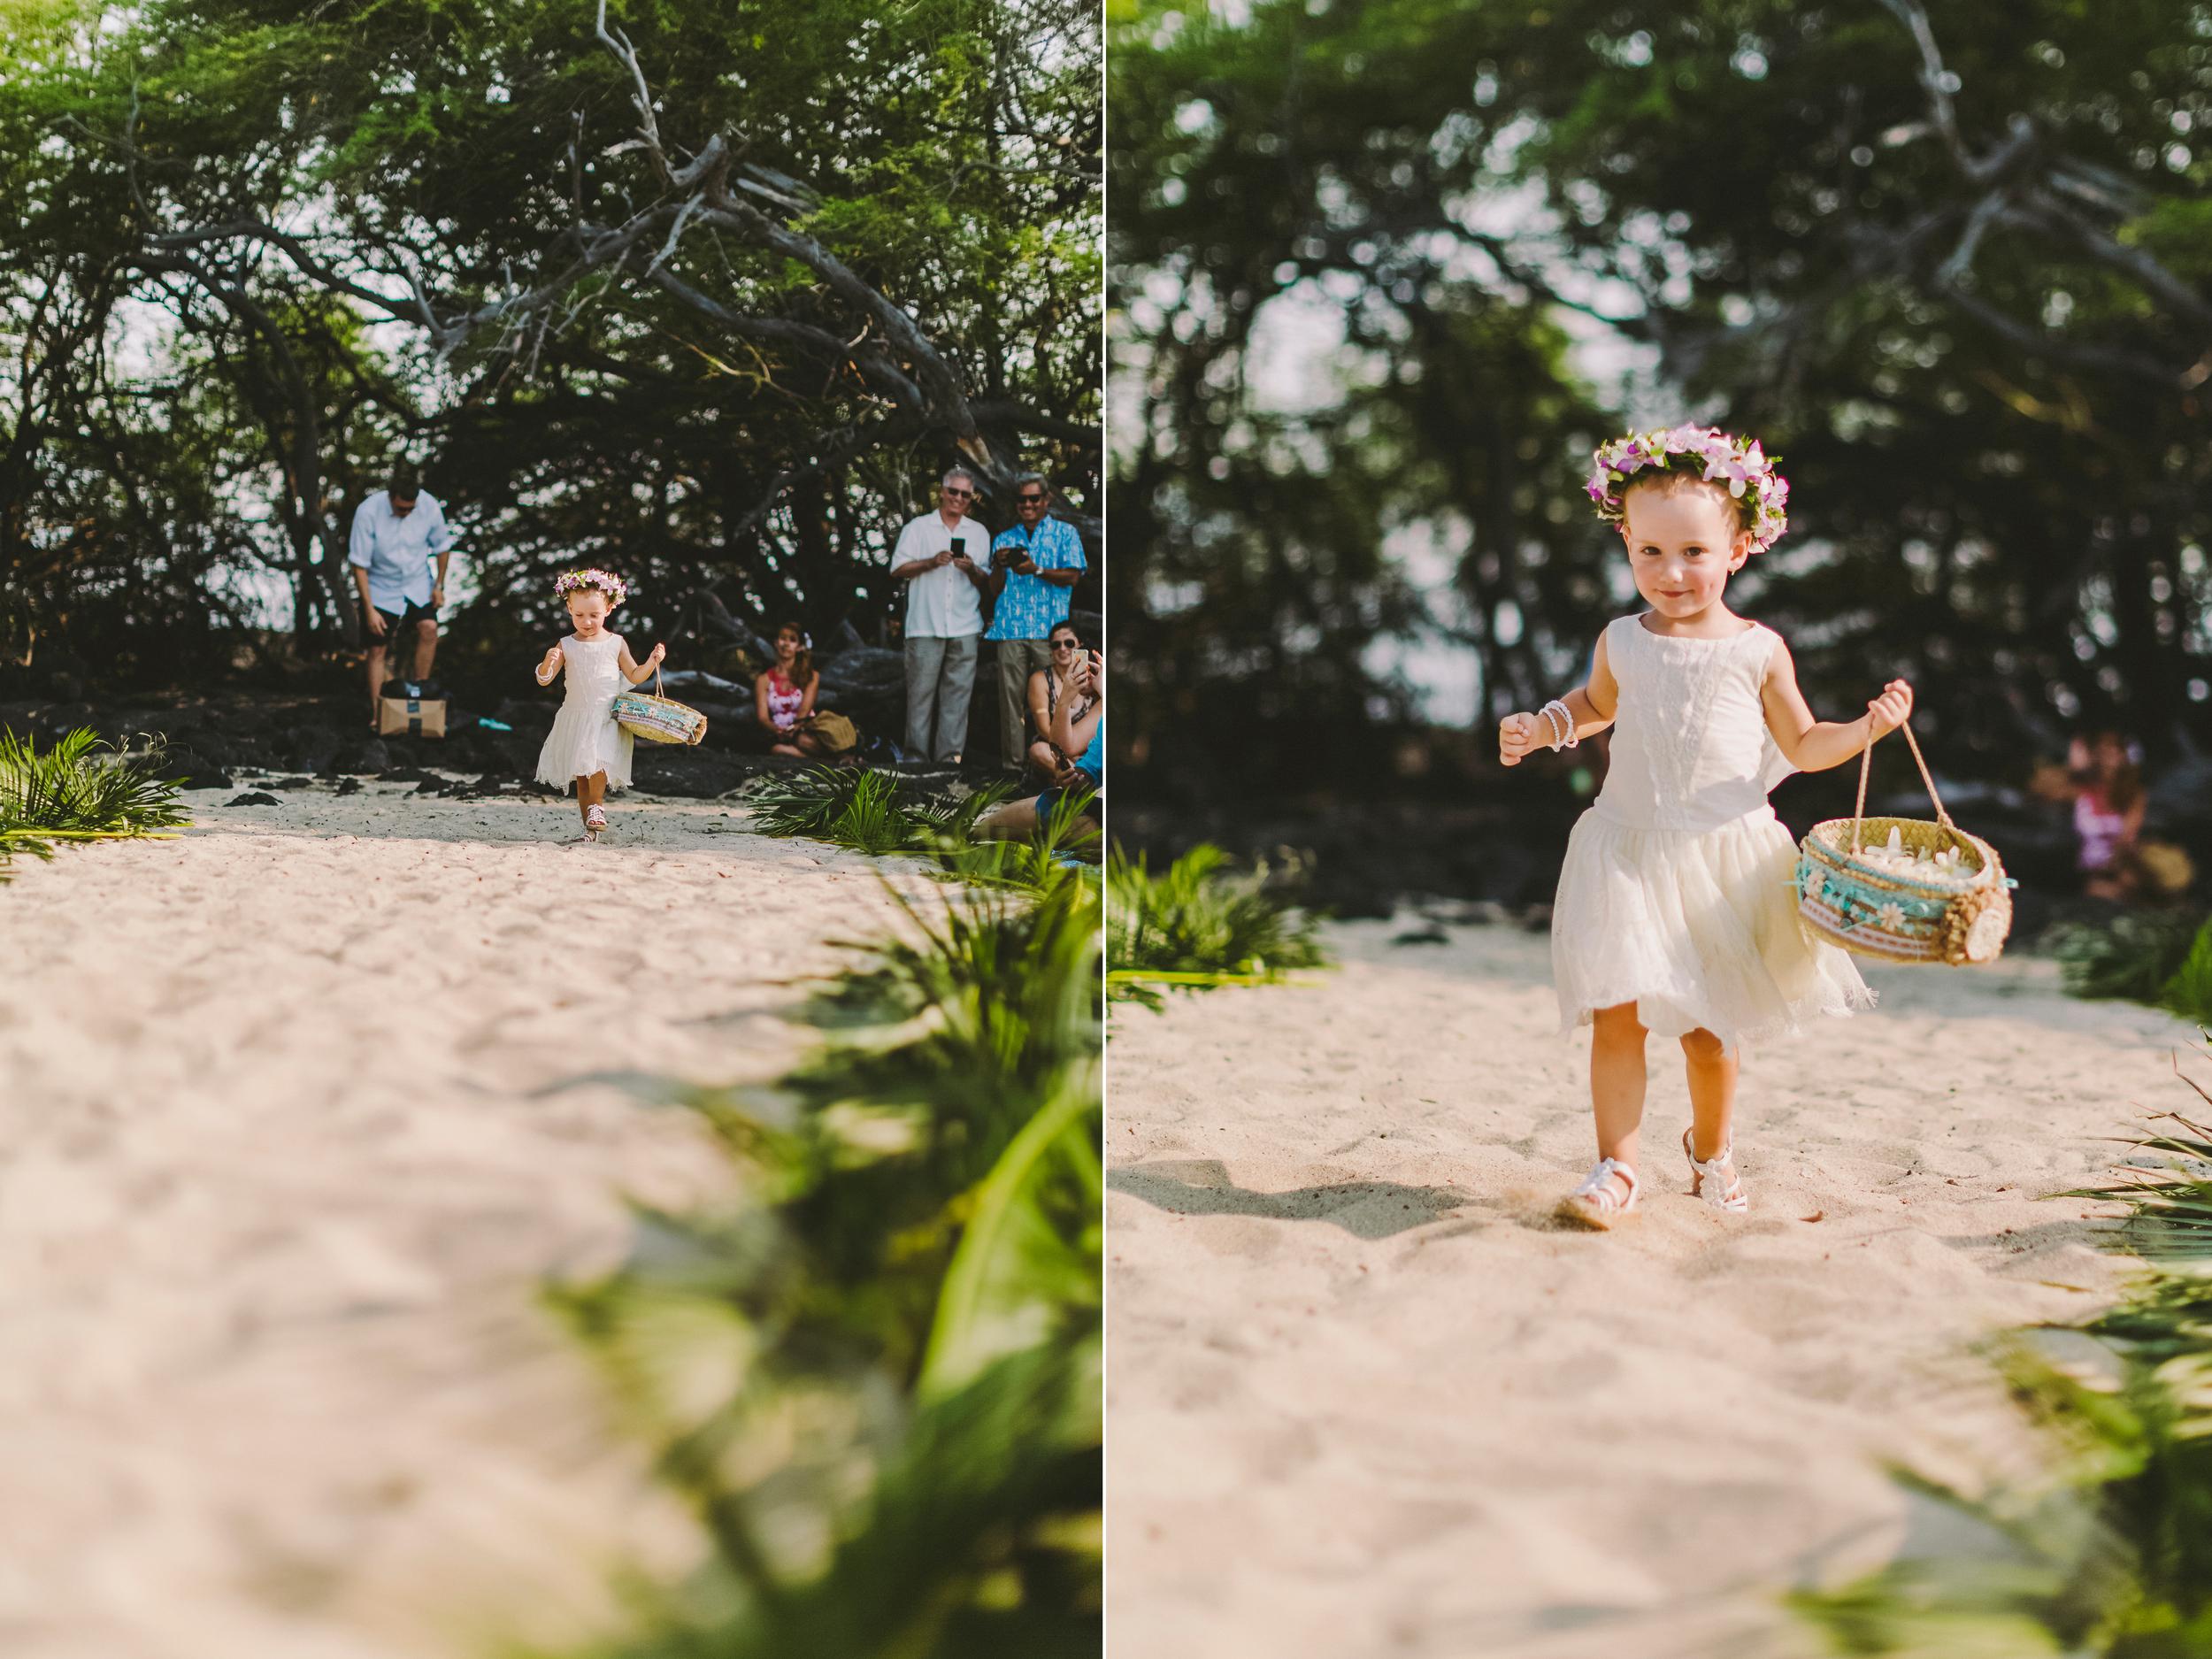 angie-diaz-photography-hawaii-wedding-photographer-kelli-jay-51.jpg